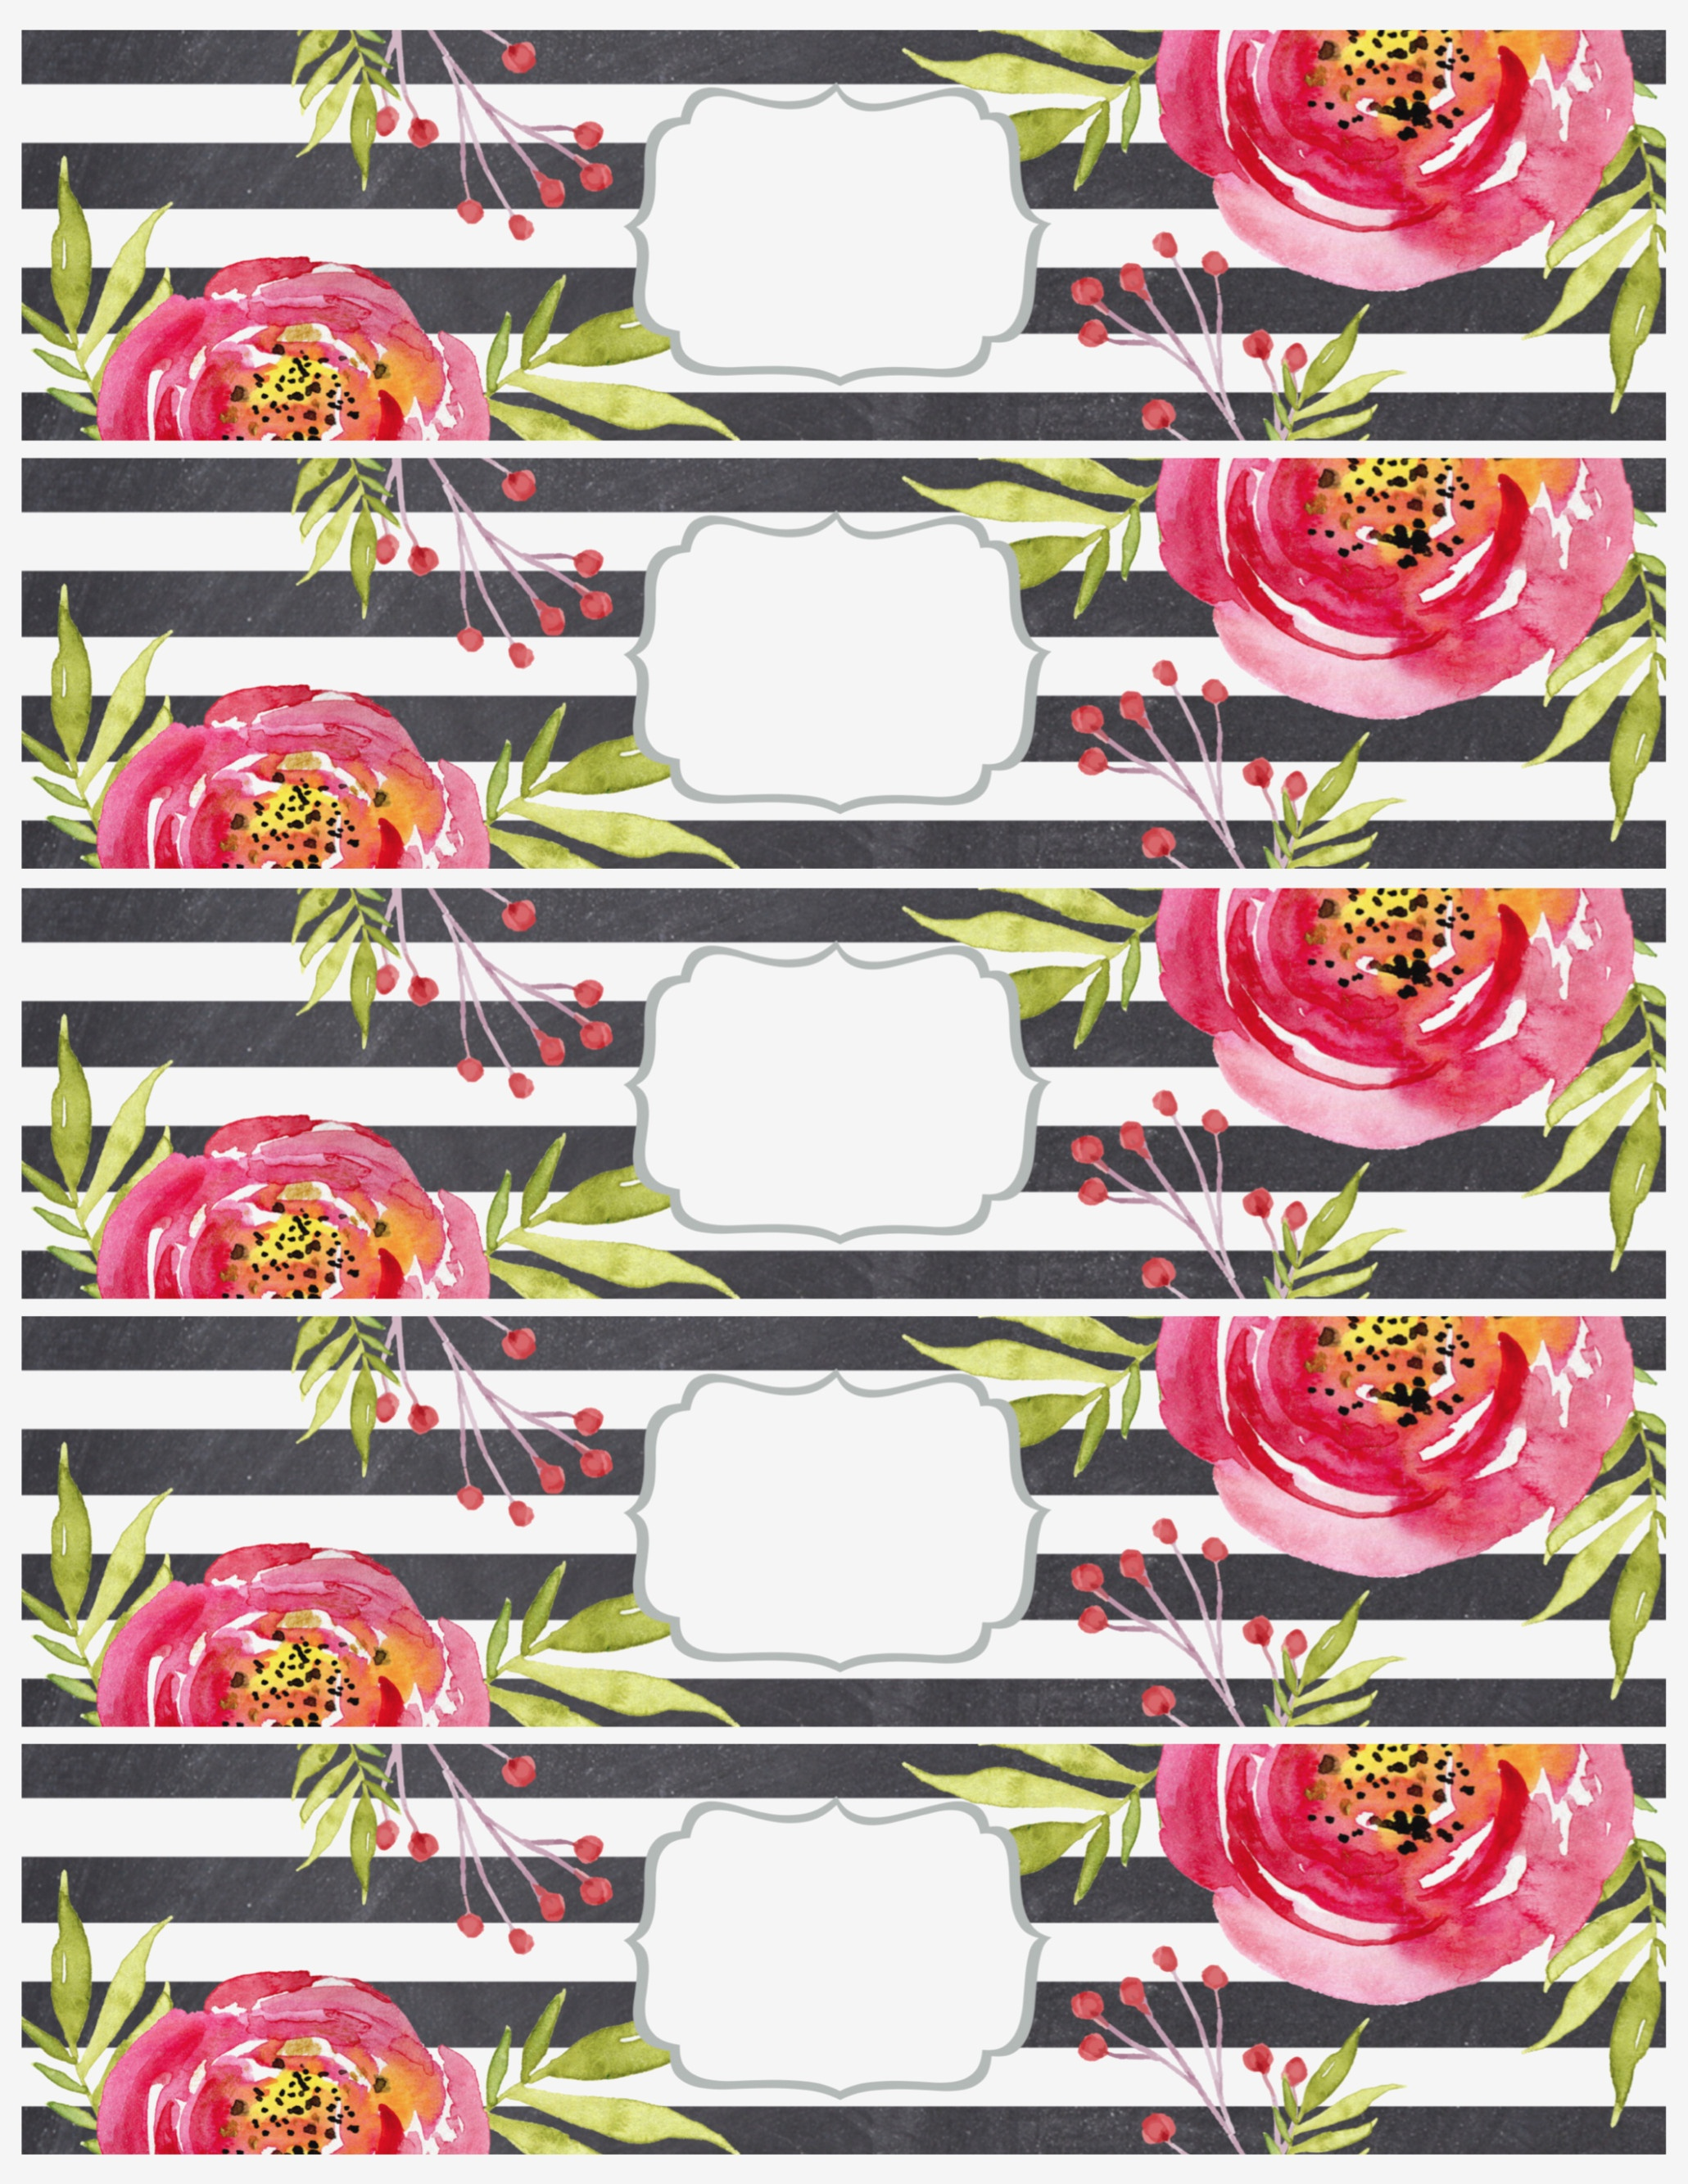 Flower Water Bottle Labels Free Printable – Paper Trail Design - Free Printable Floral Labels